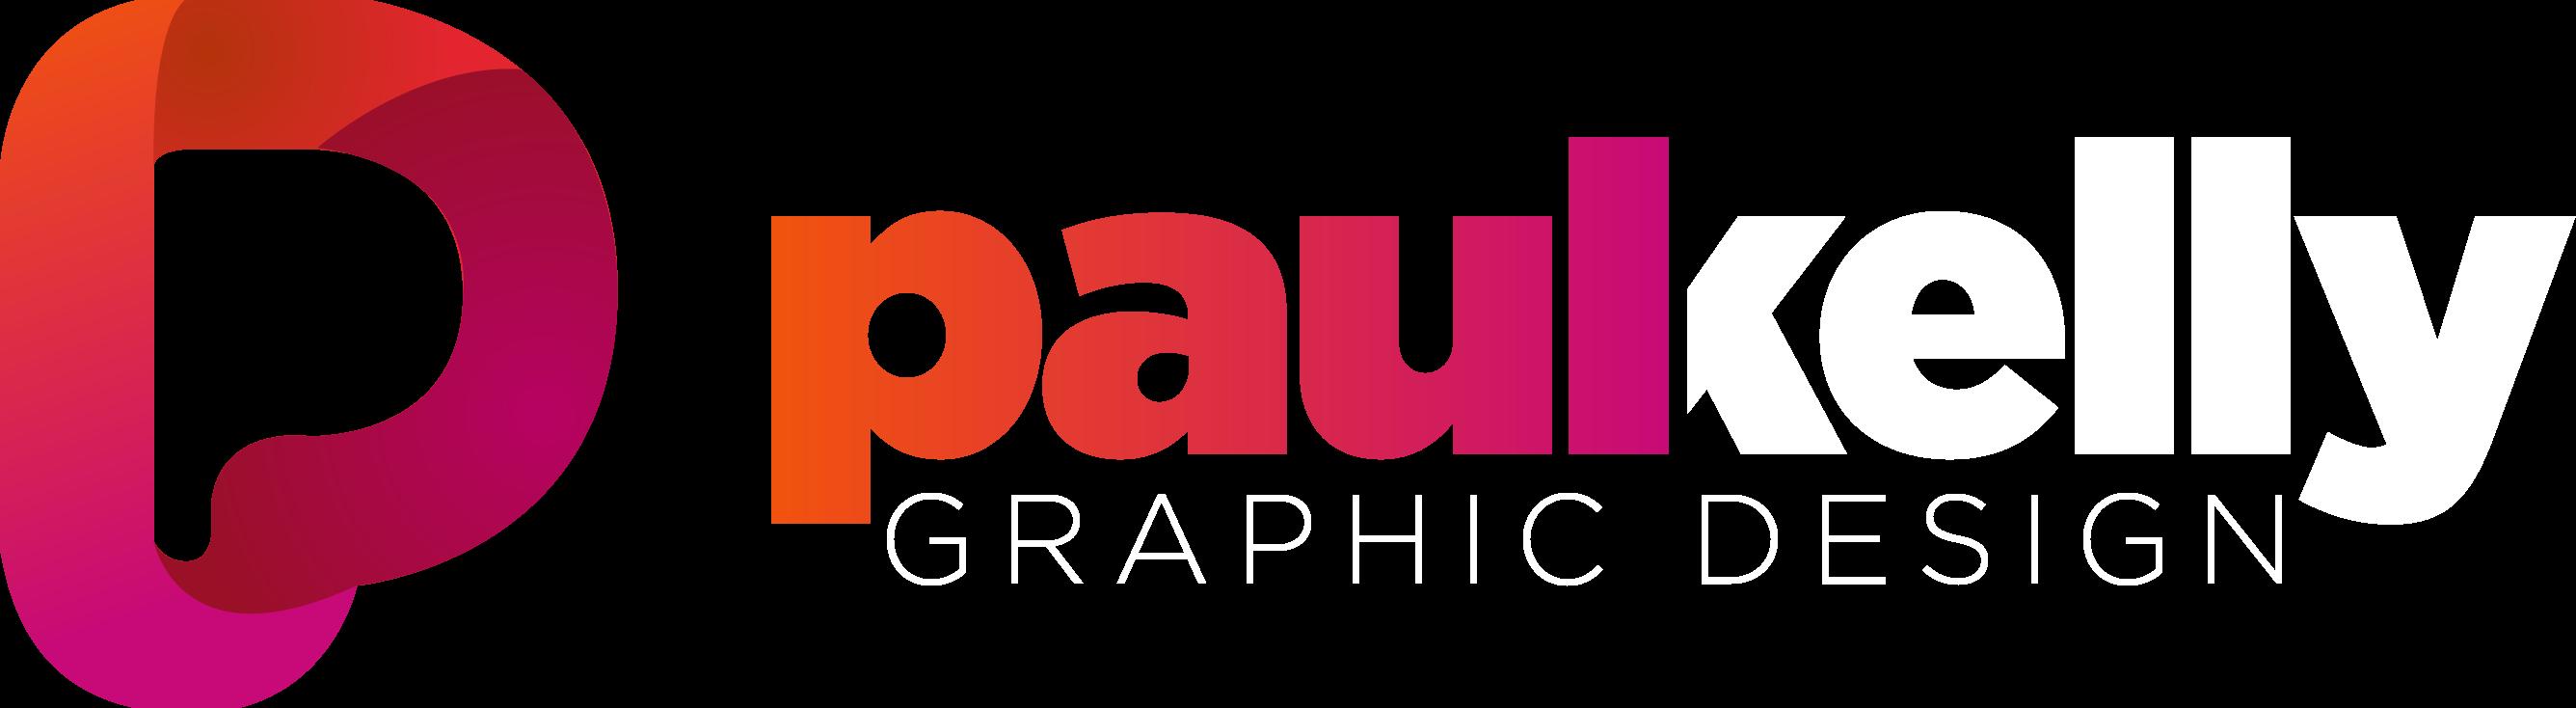 Paul Kelly Graphic Design